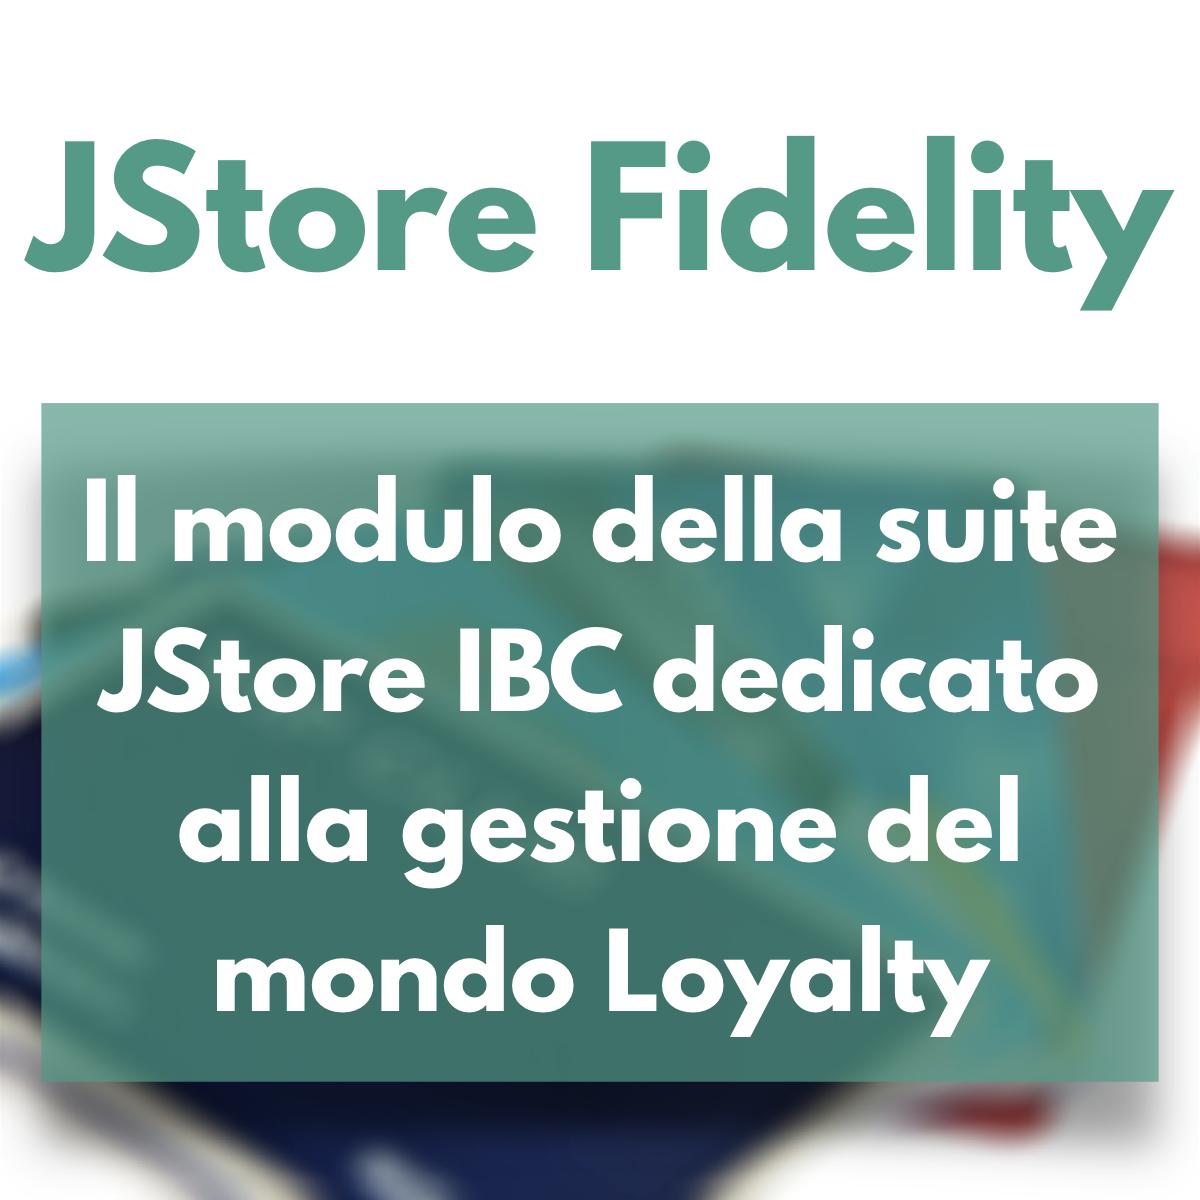 JStore Fidelity